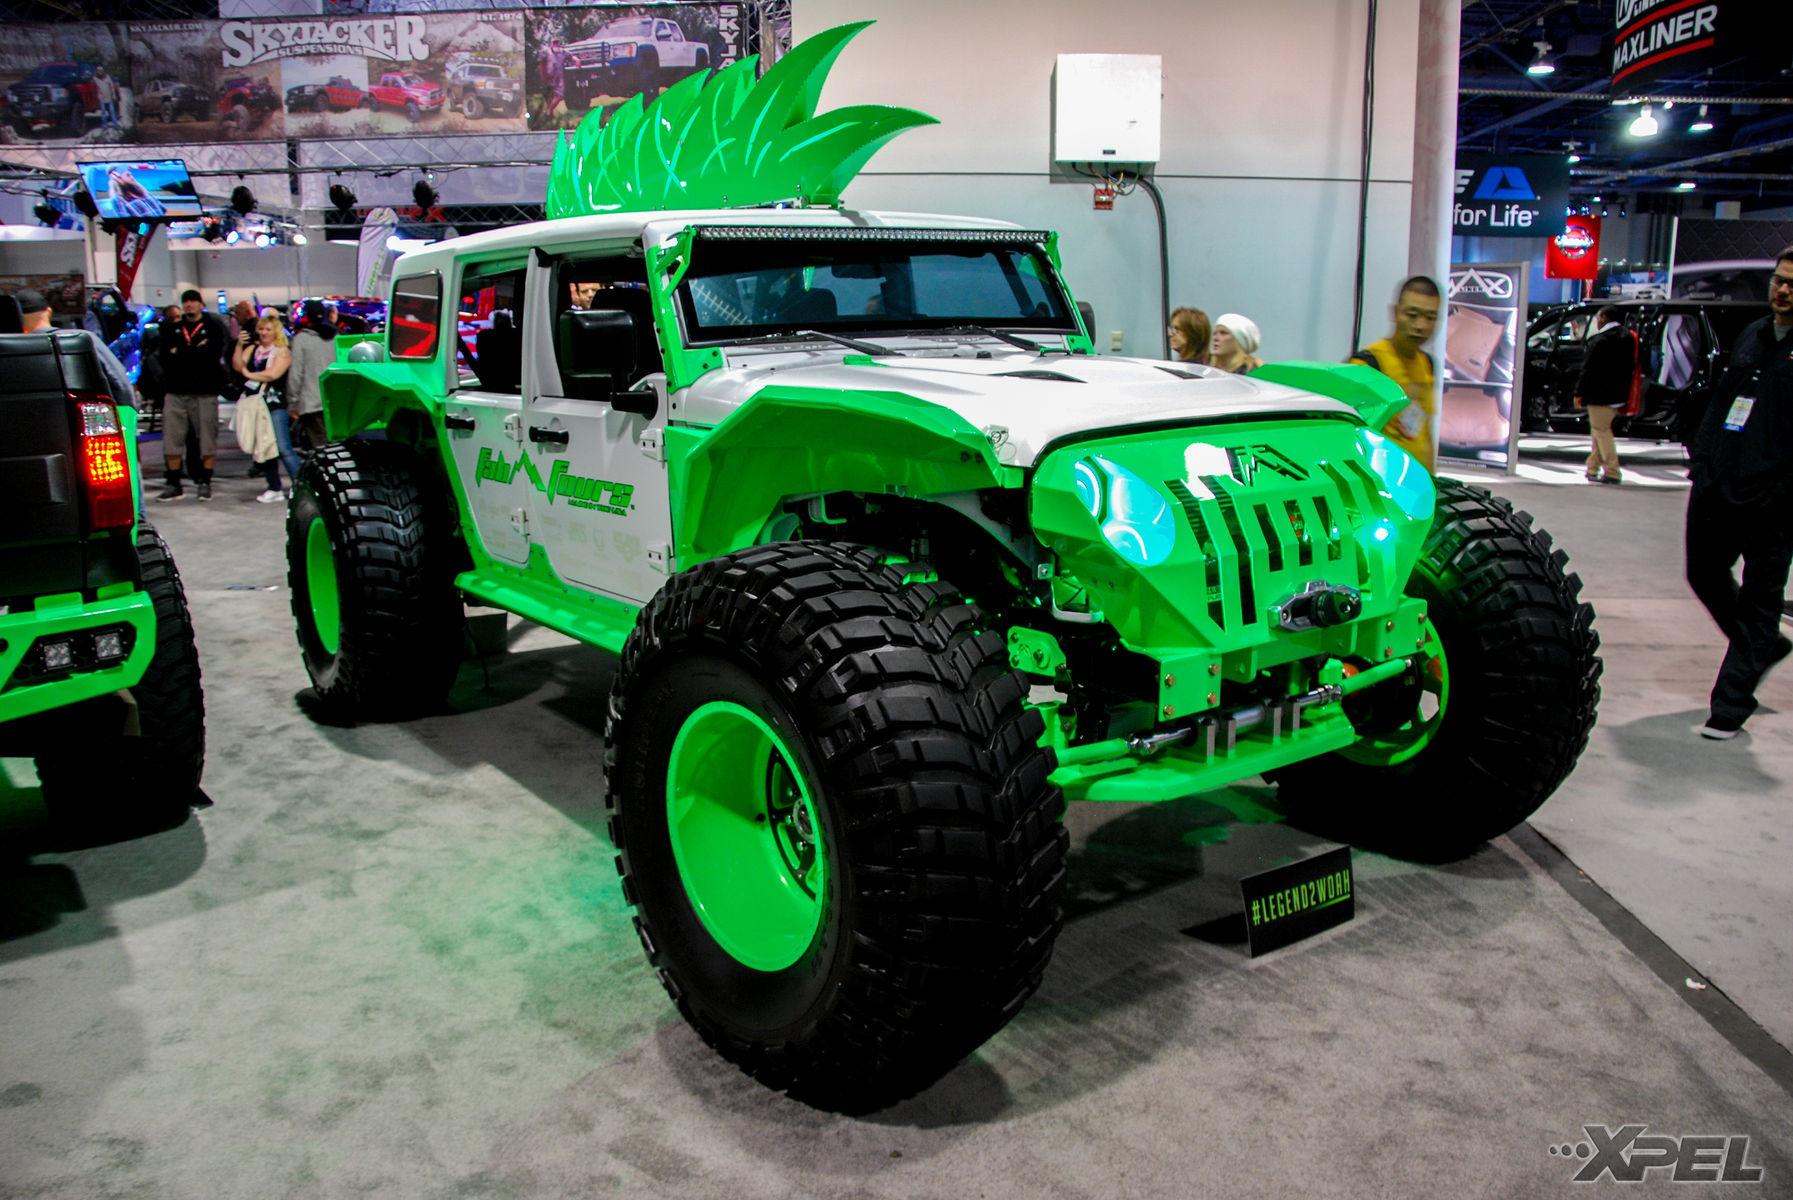 Jeep Wrangler | Shots from around SEMA show